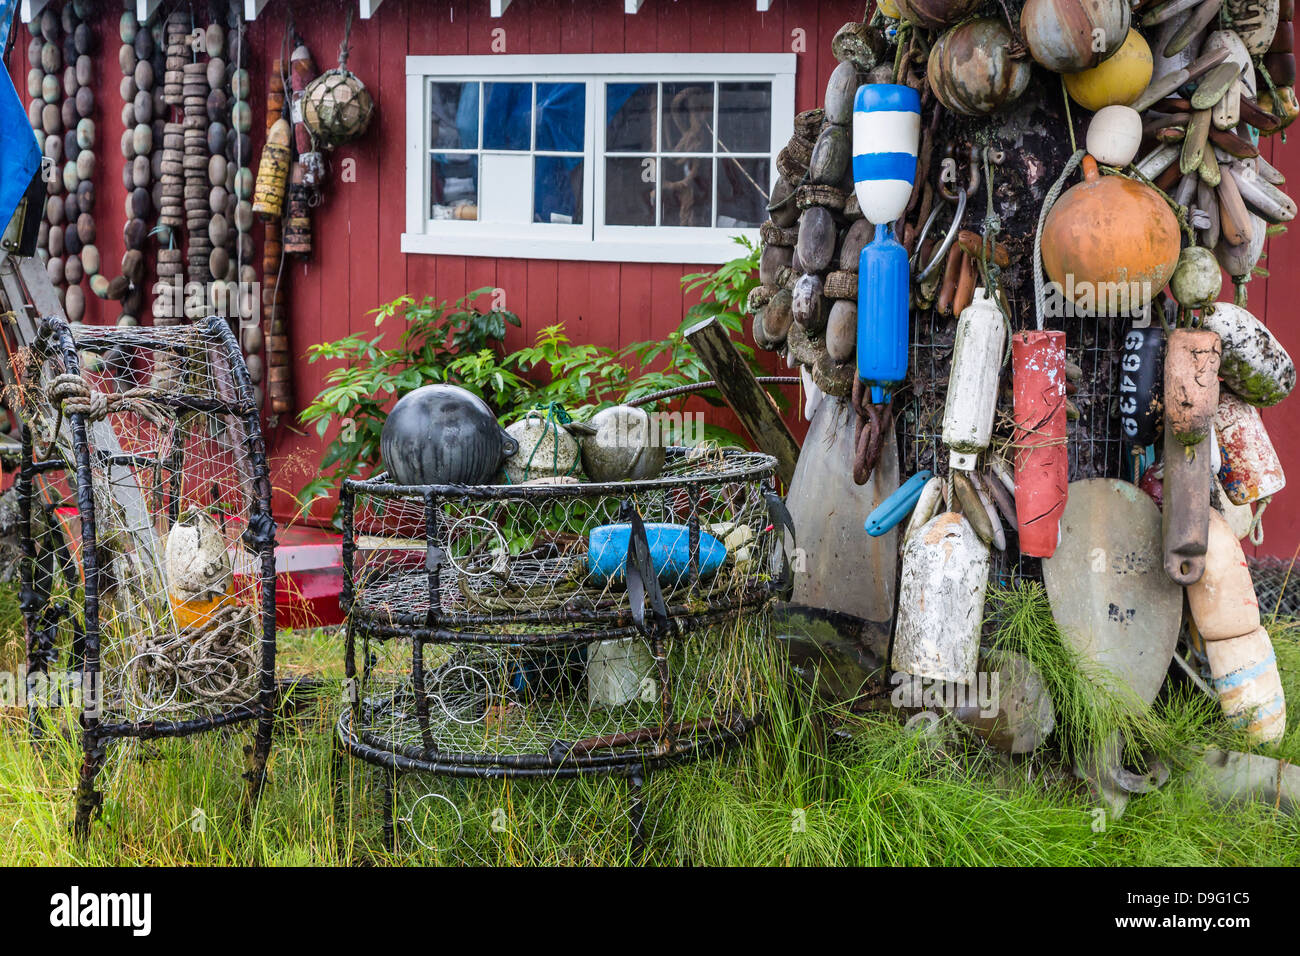 The Norwegian fishing town of Petersburg, Southeast Alaska, USA - Stock Image